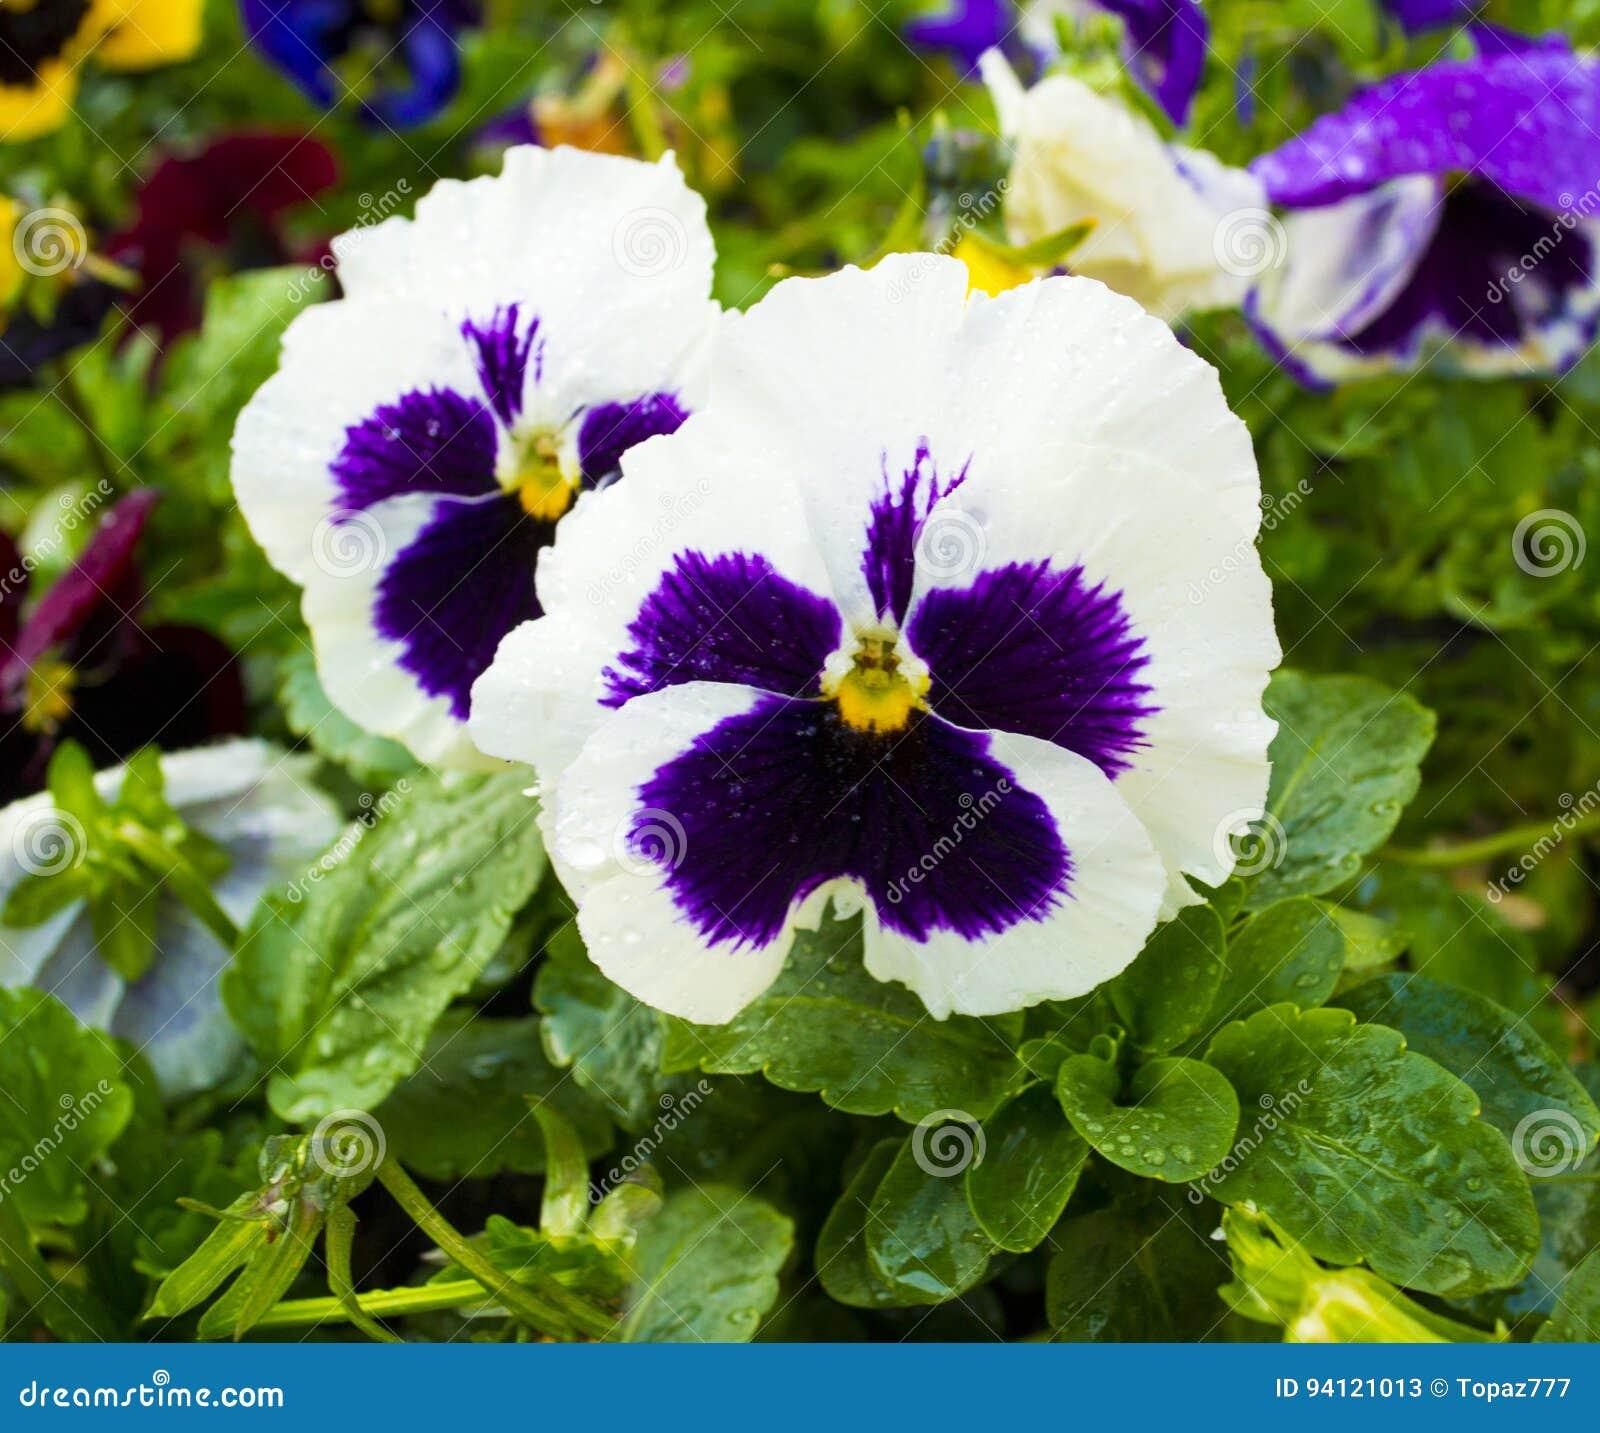 Violet Flower Pansies Flower Pansy Colorful Pansies White Pa